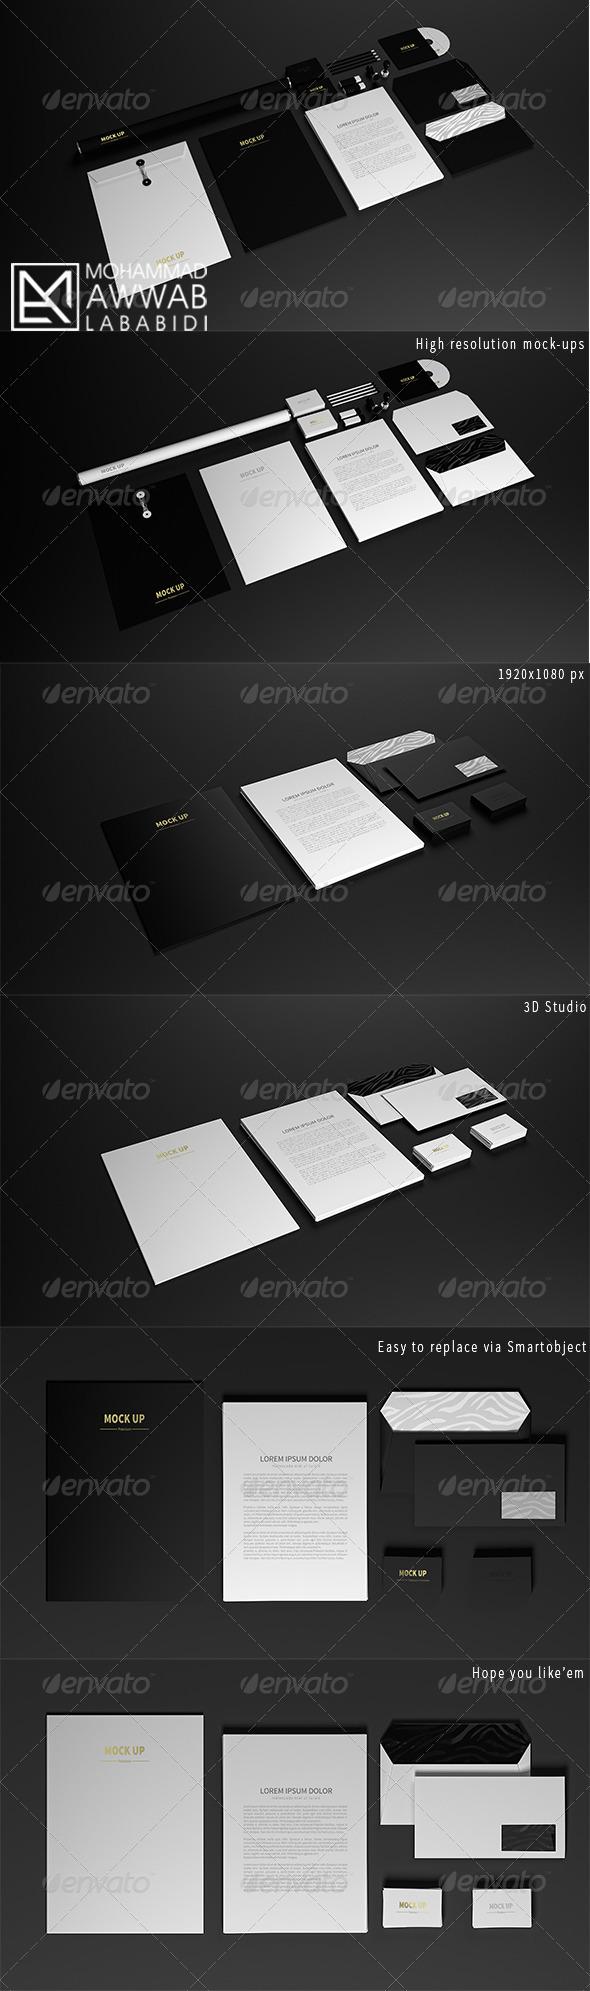 GraphicRiver Stationary Mock-Up 8714847